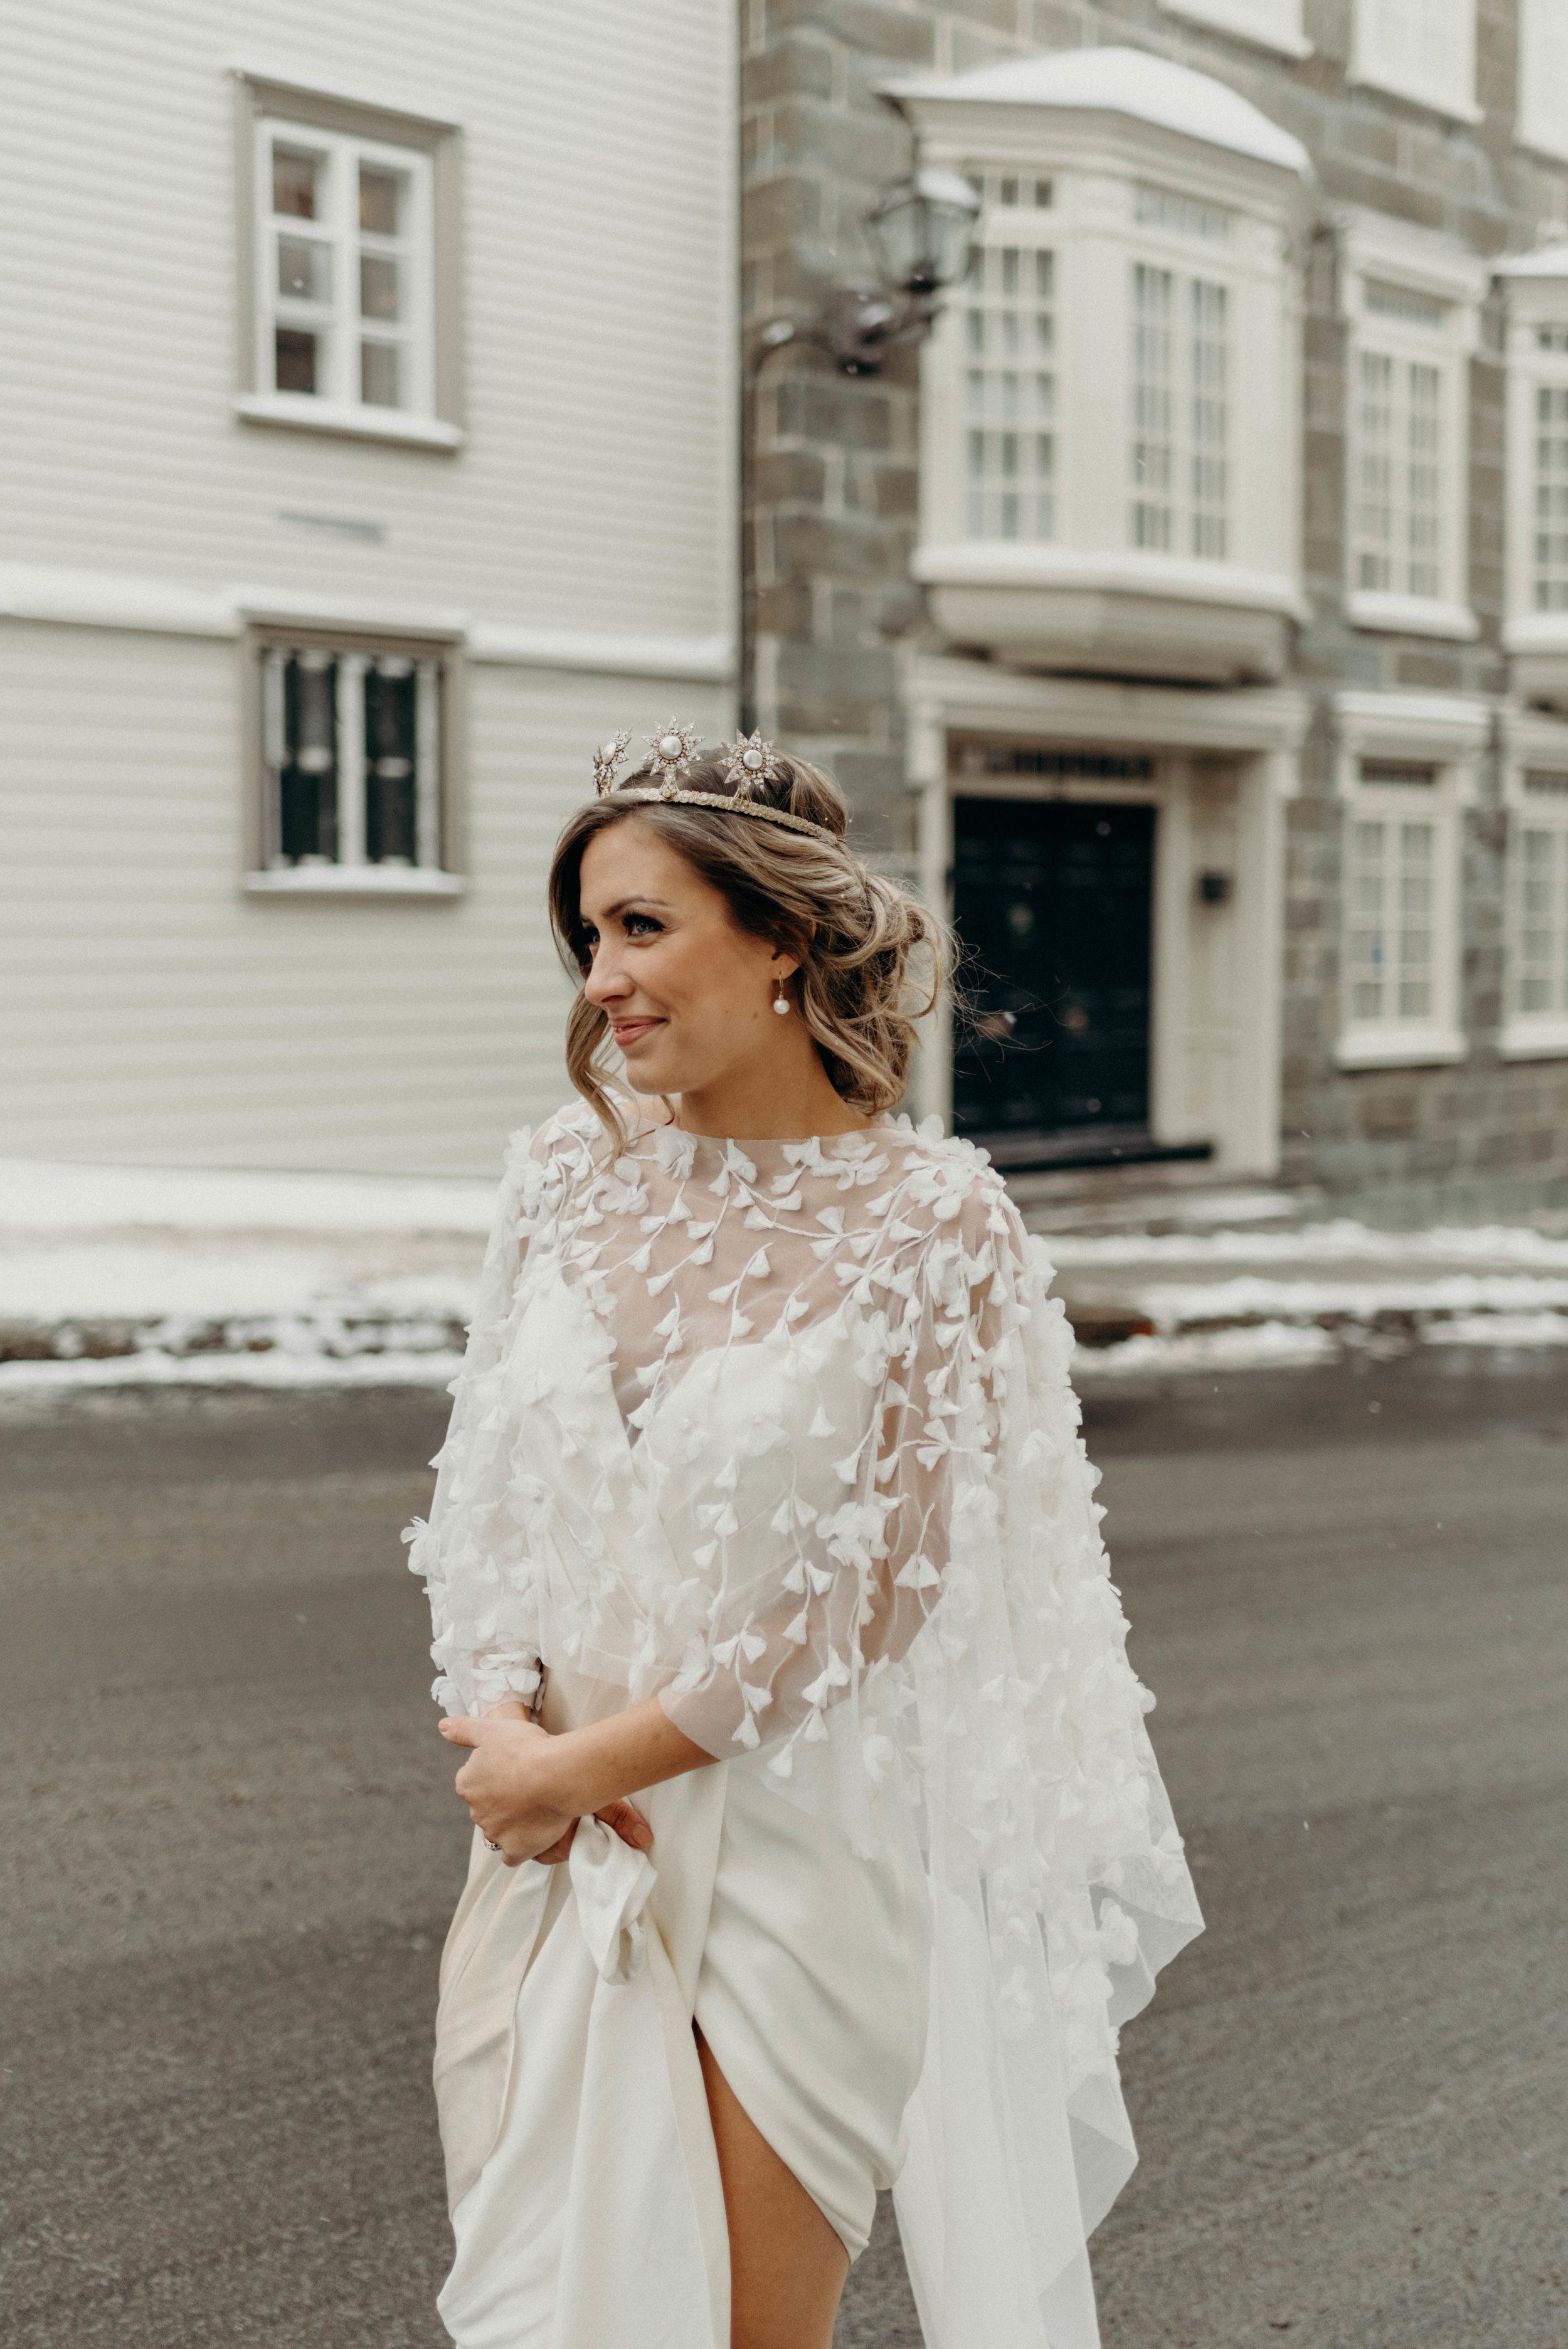 Quebec City Canada urban bridal portrait